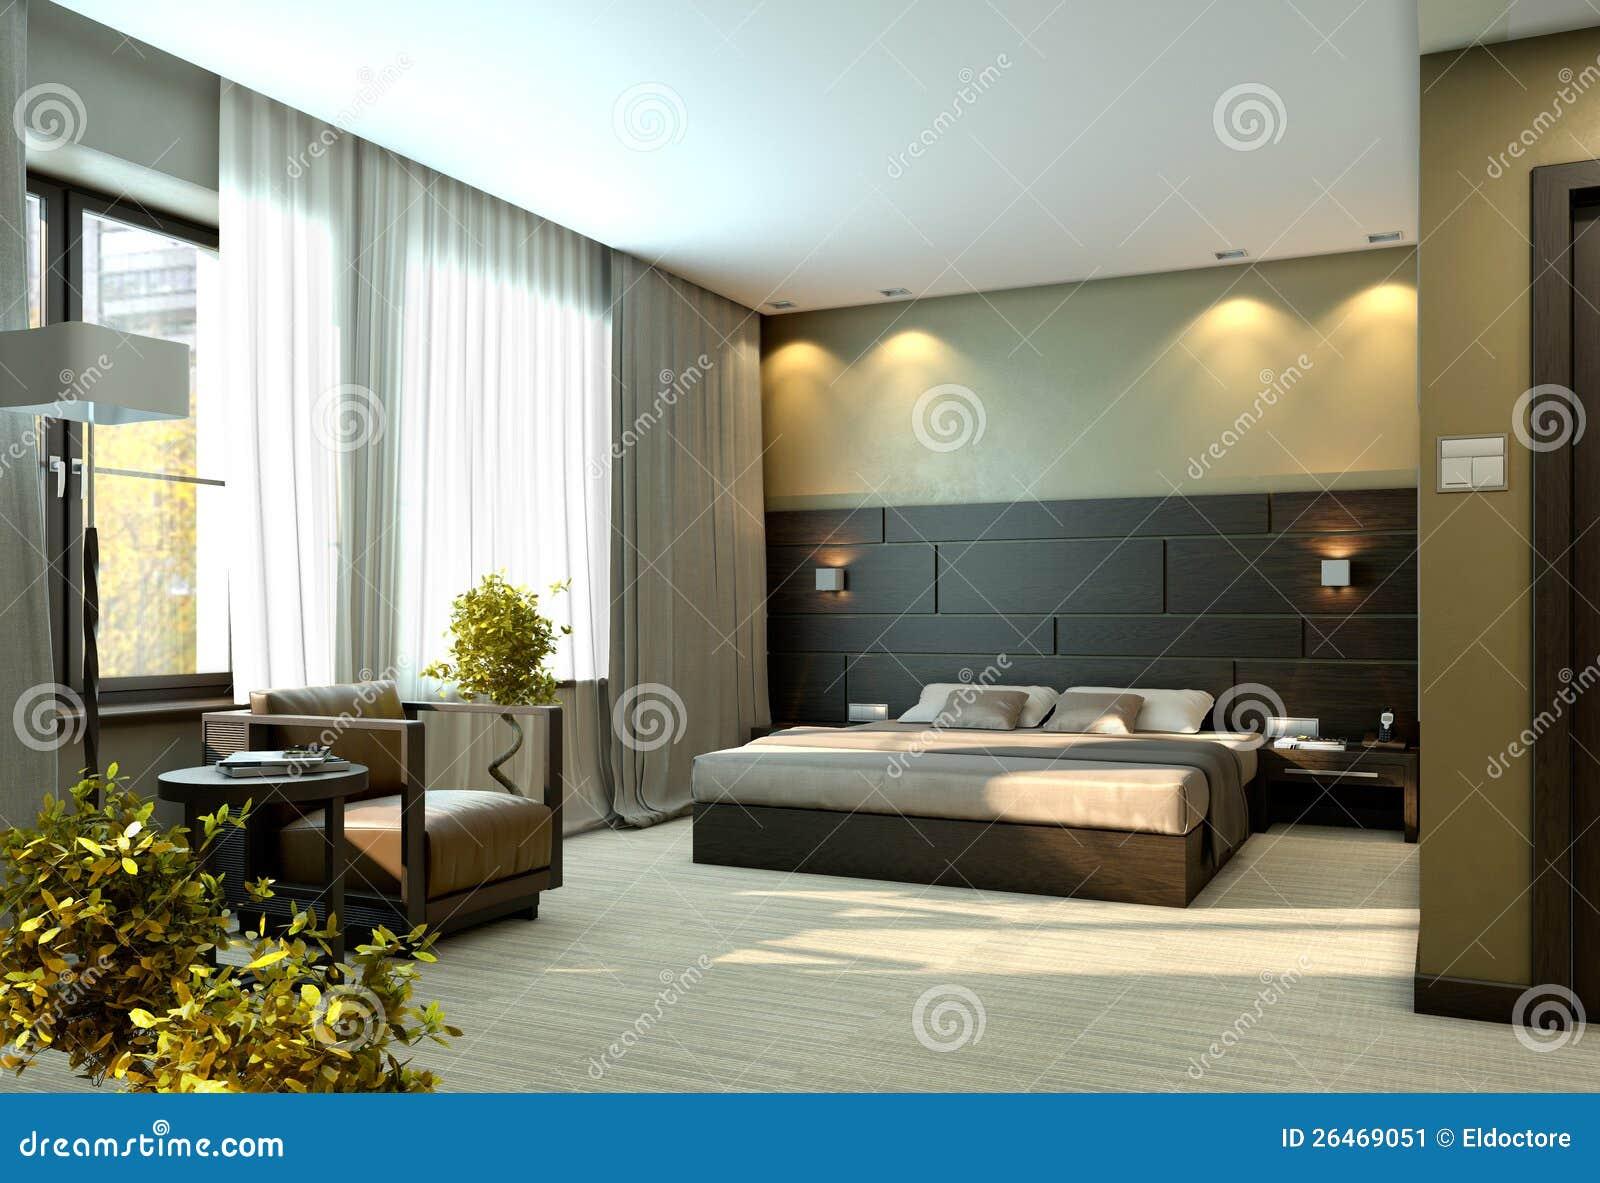 Chambre Coucher Beige De Luxe Moderne Image Stock